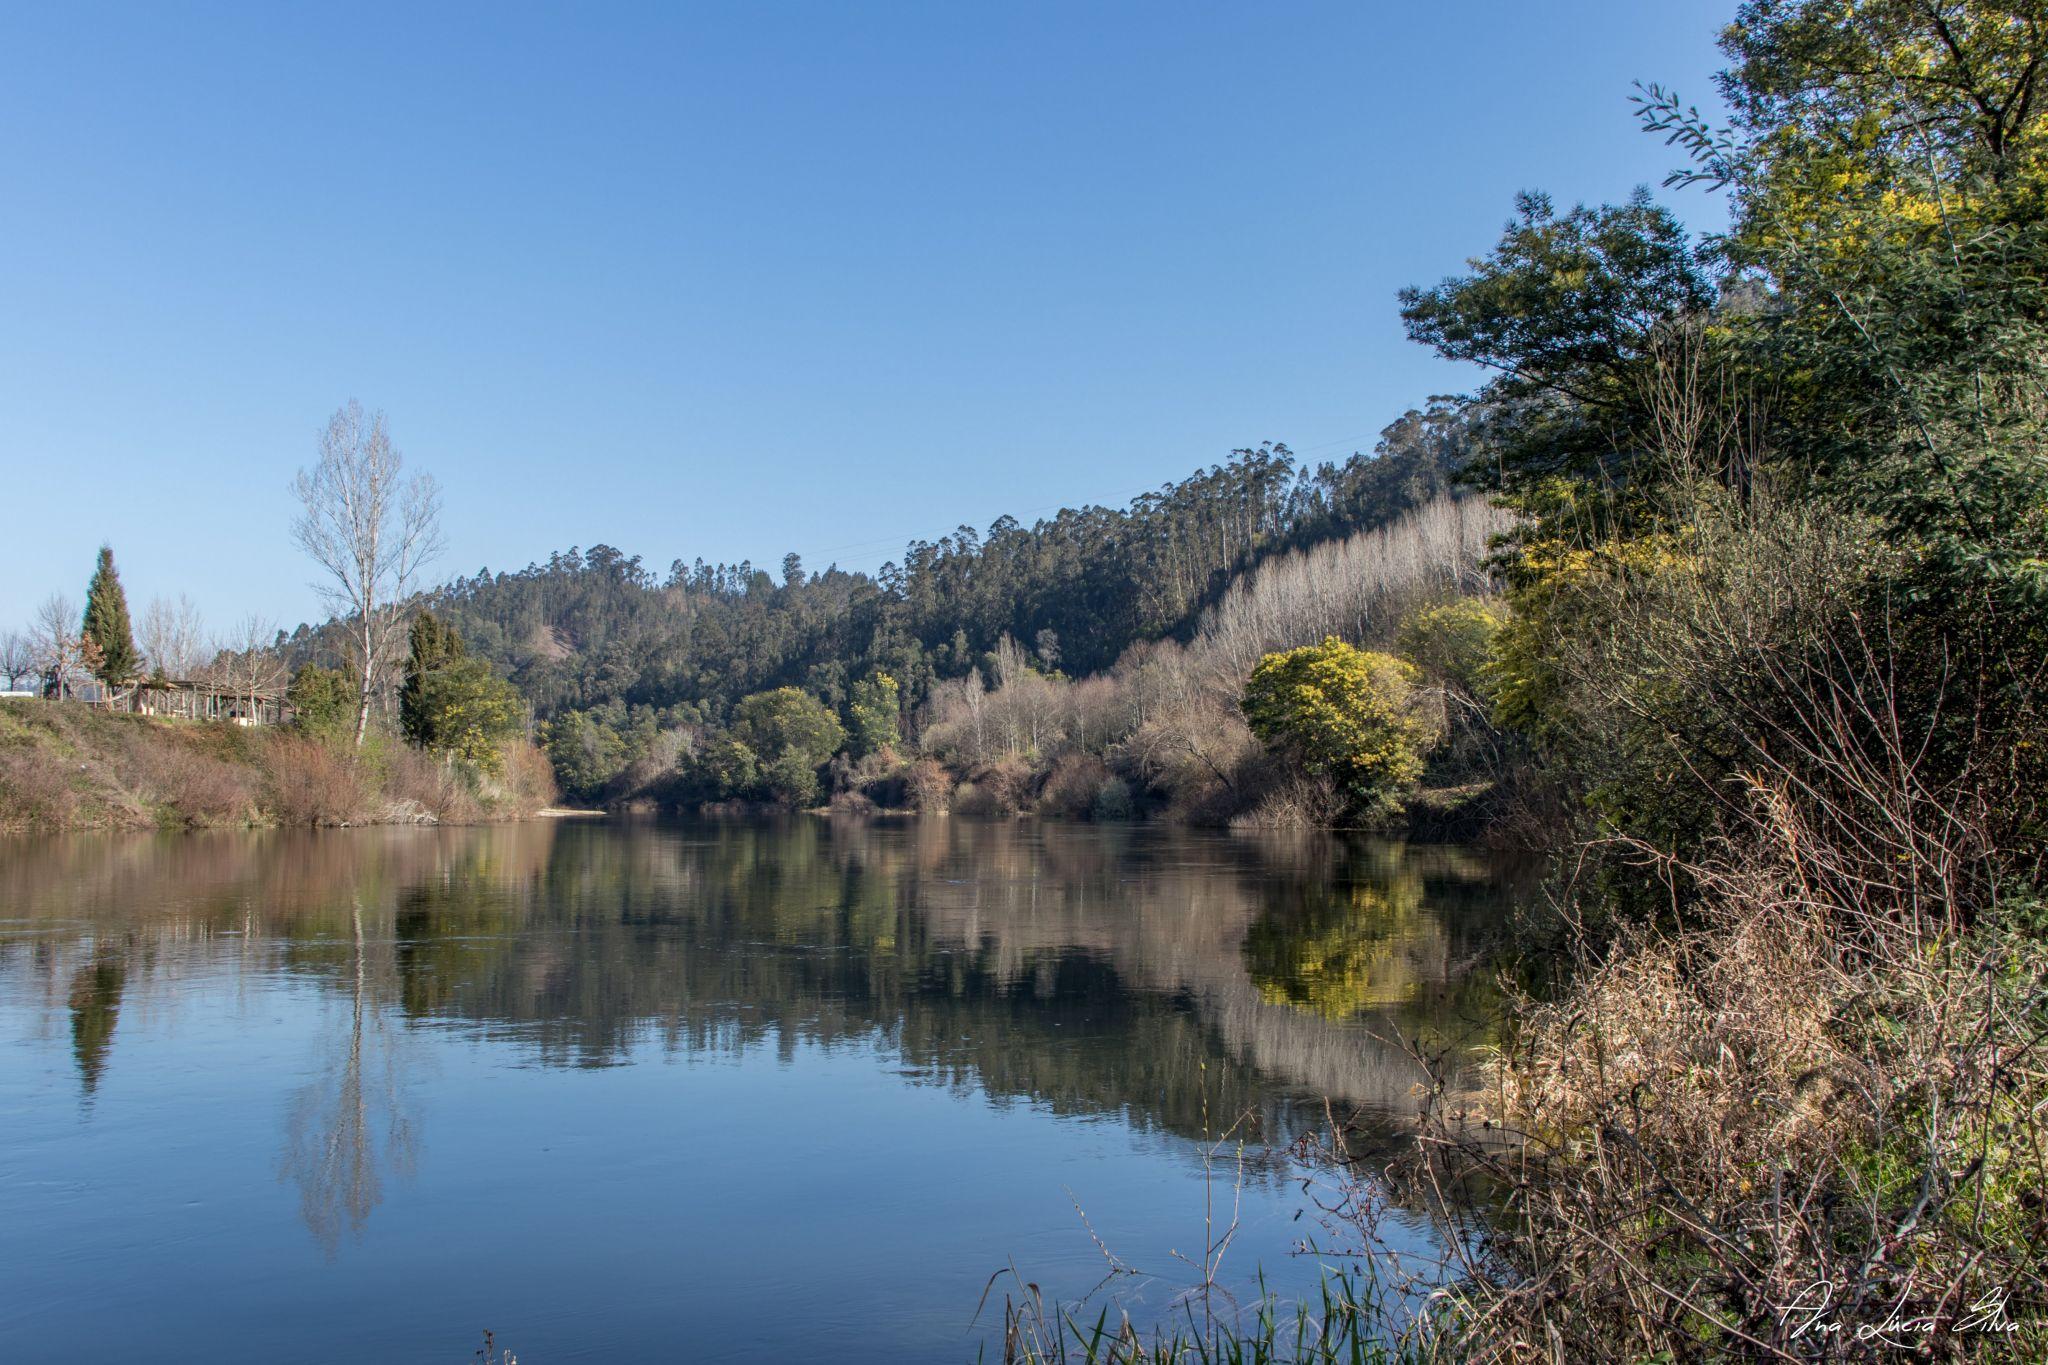 Louredo, Penacova, Portugal